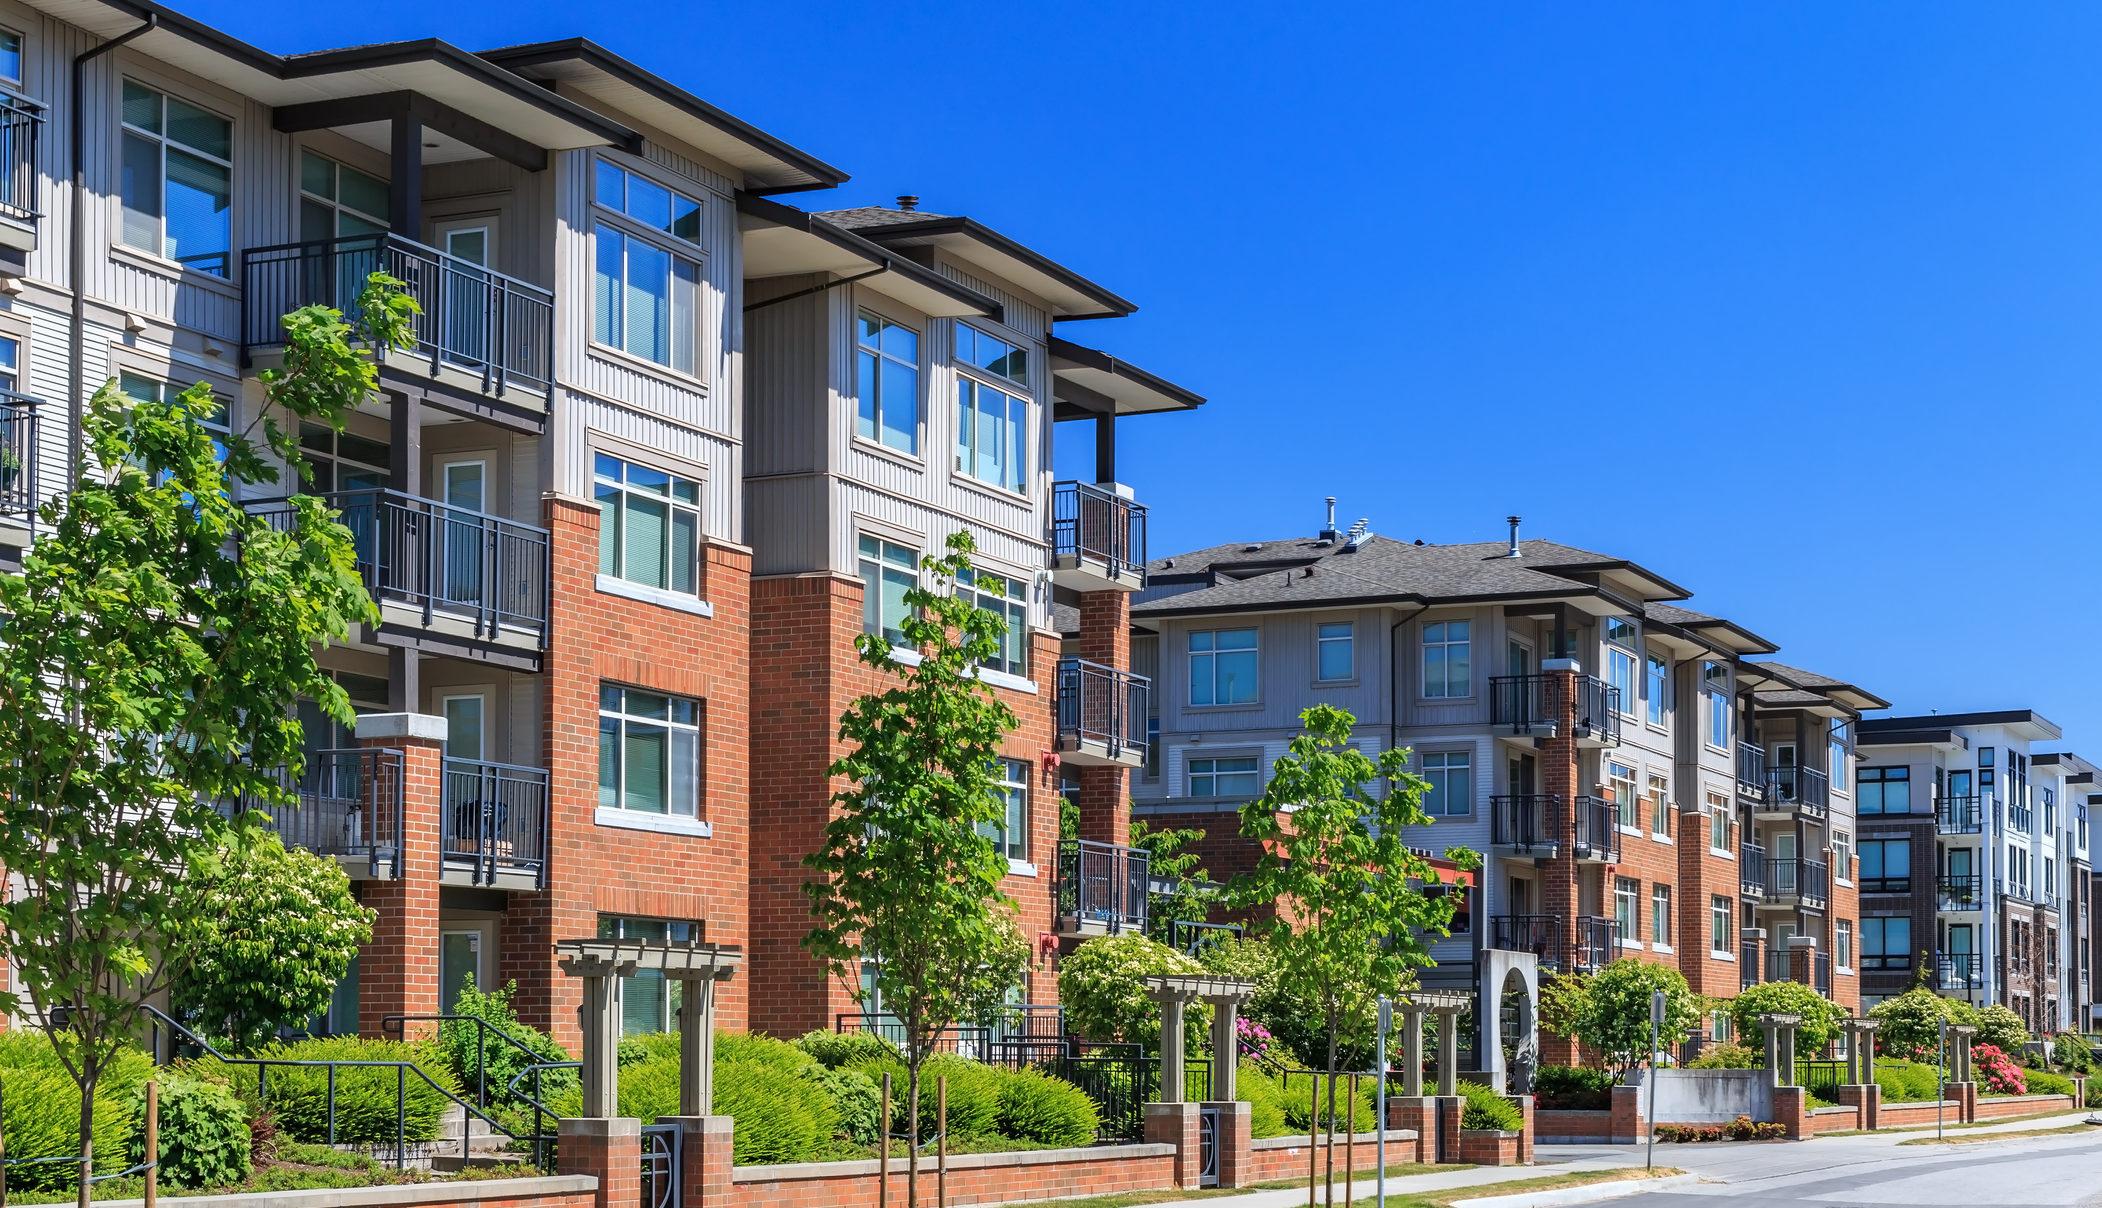 Commercial Real Estate Dallas